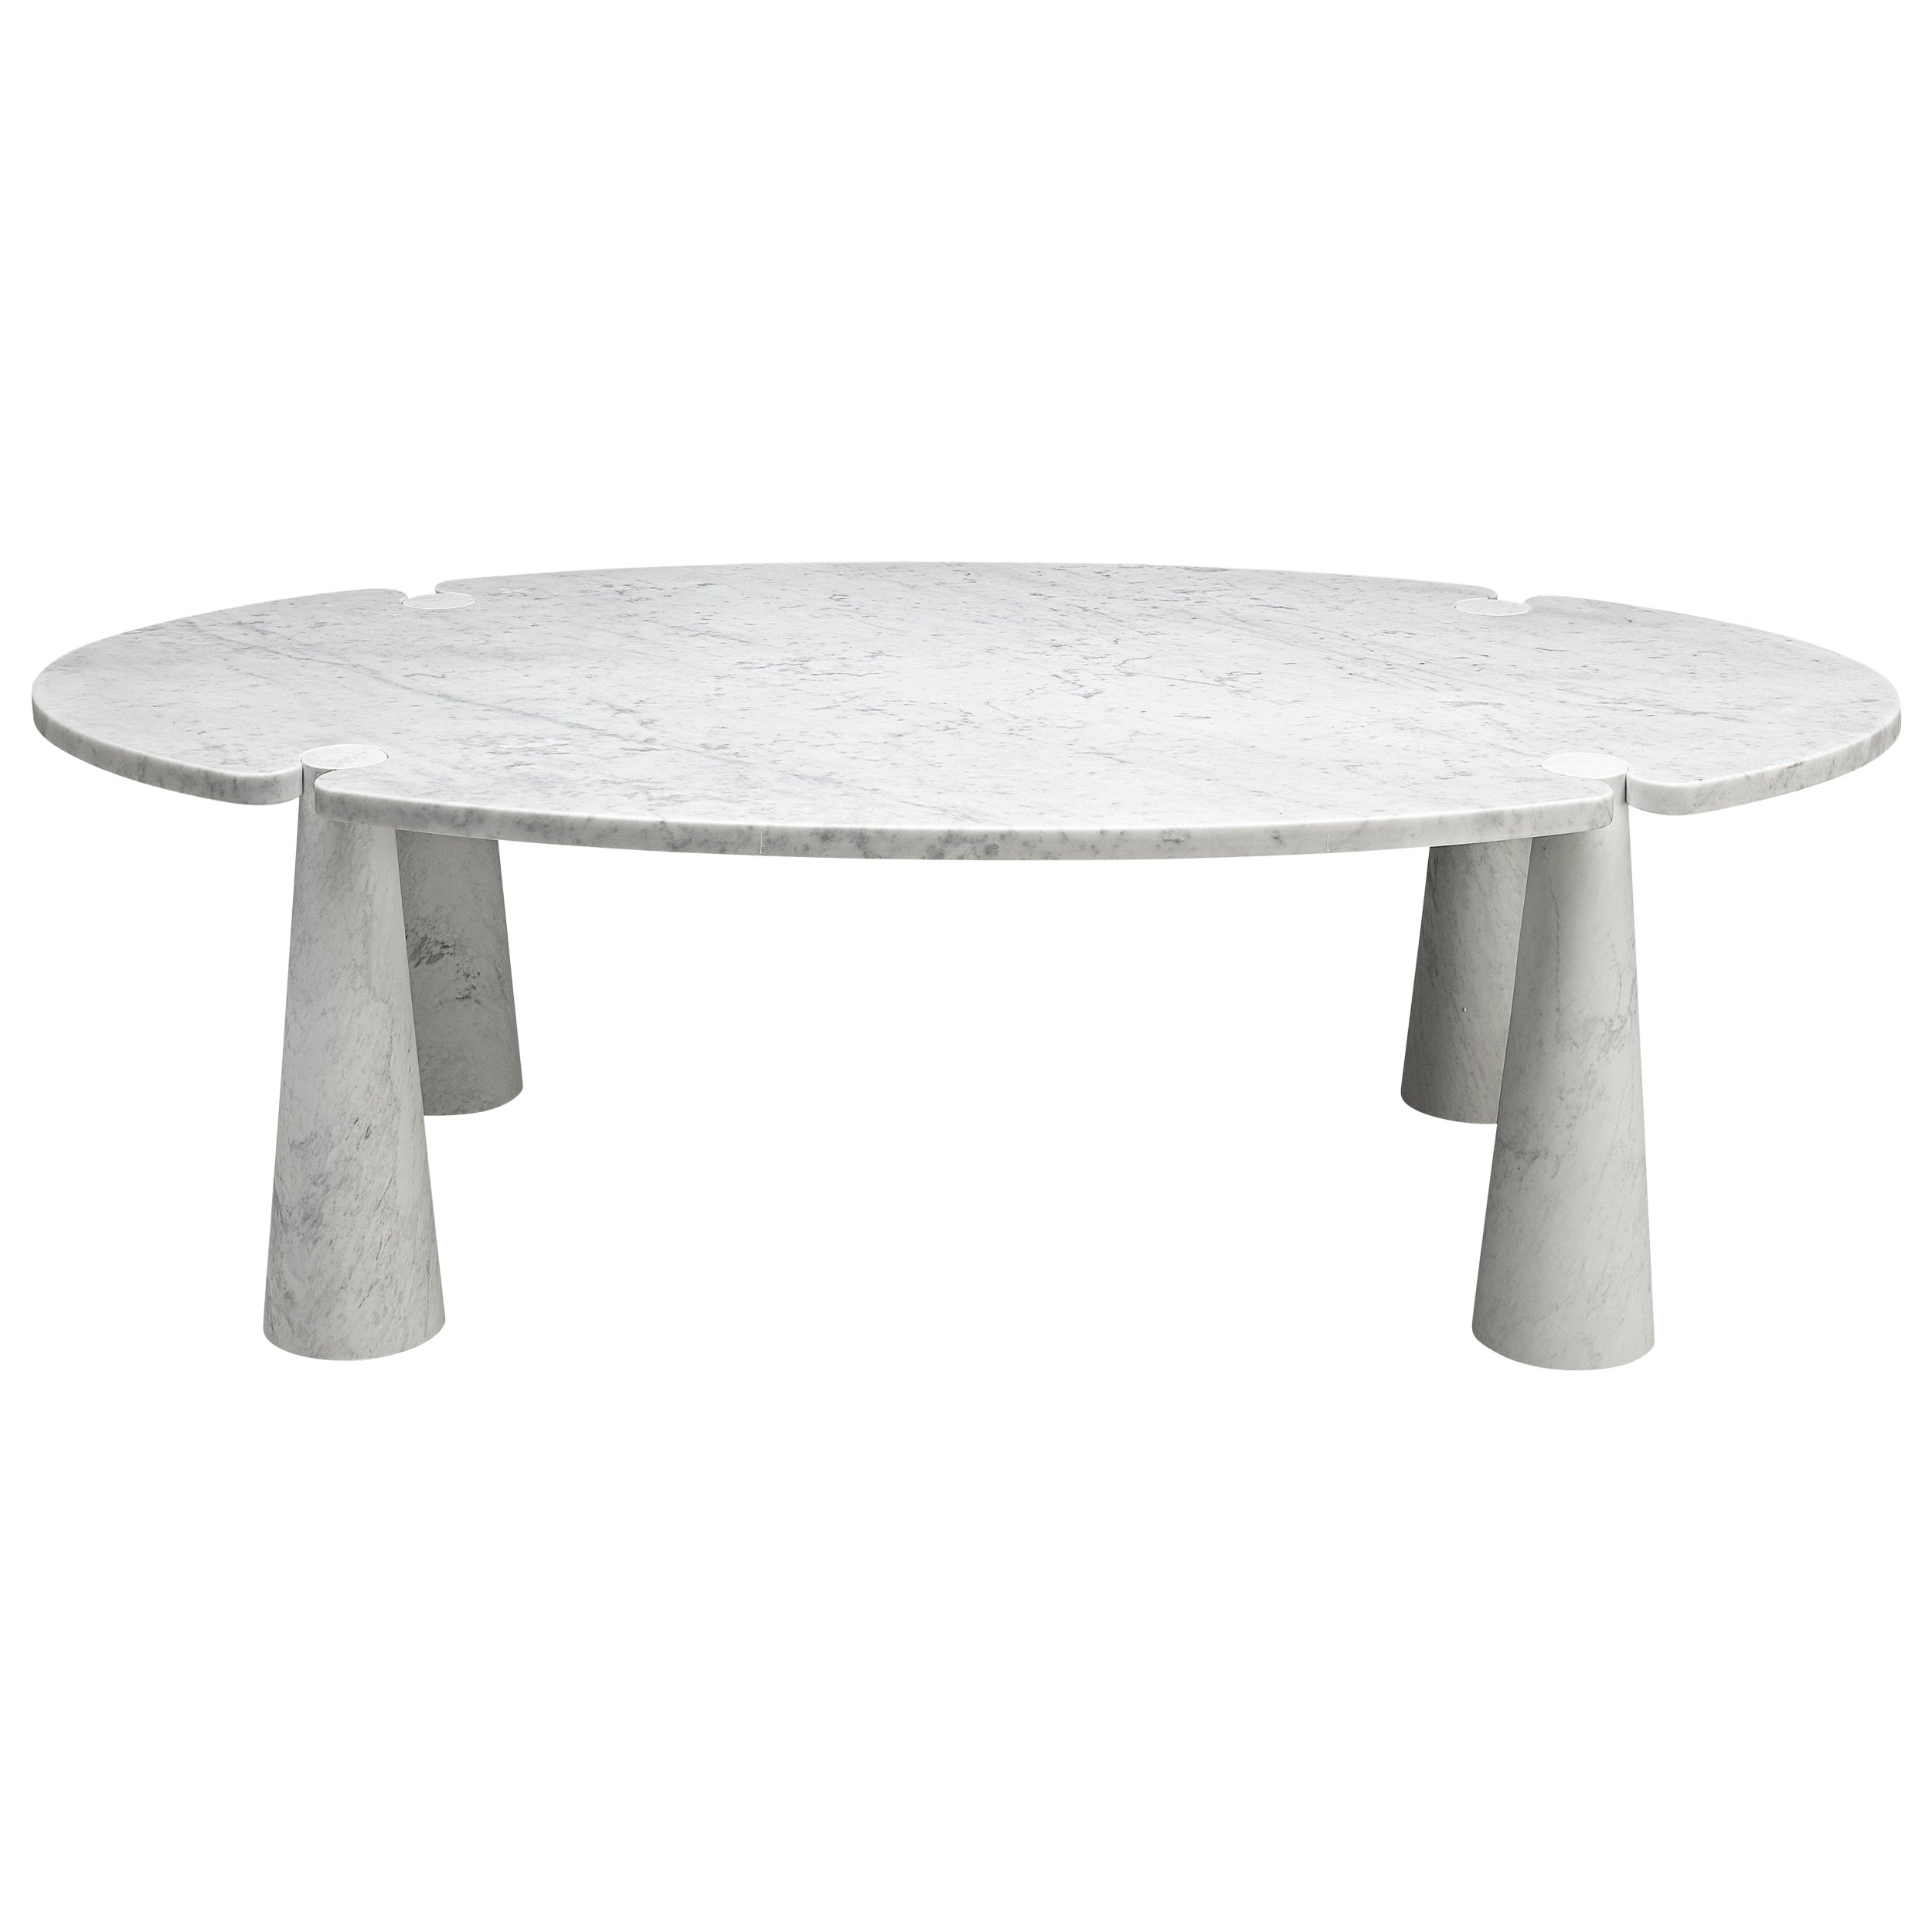 Angelo Mangiarotti 'Eros' Marble Dining Table